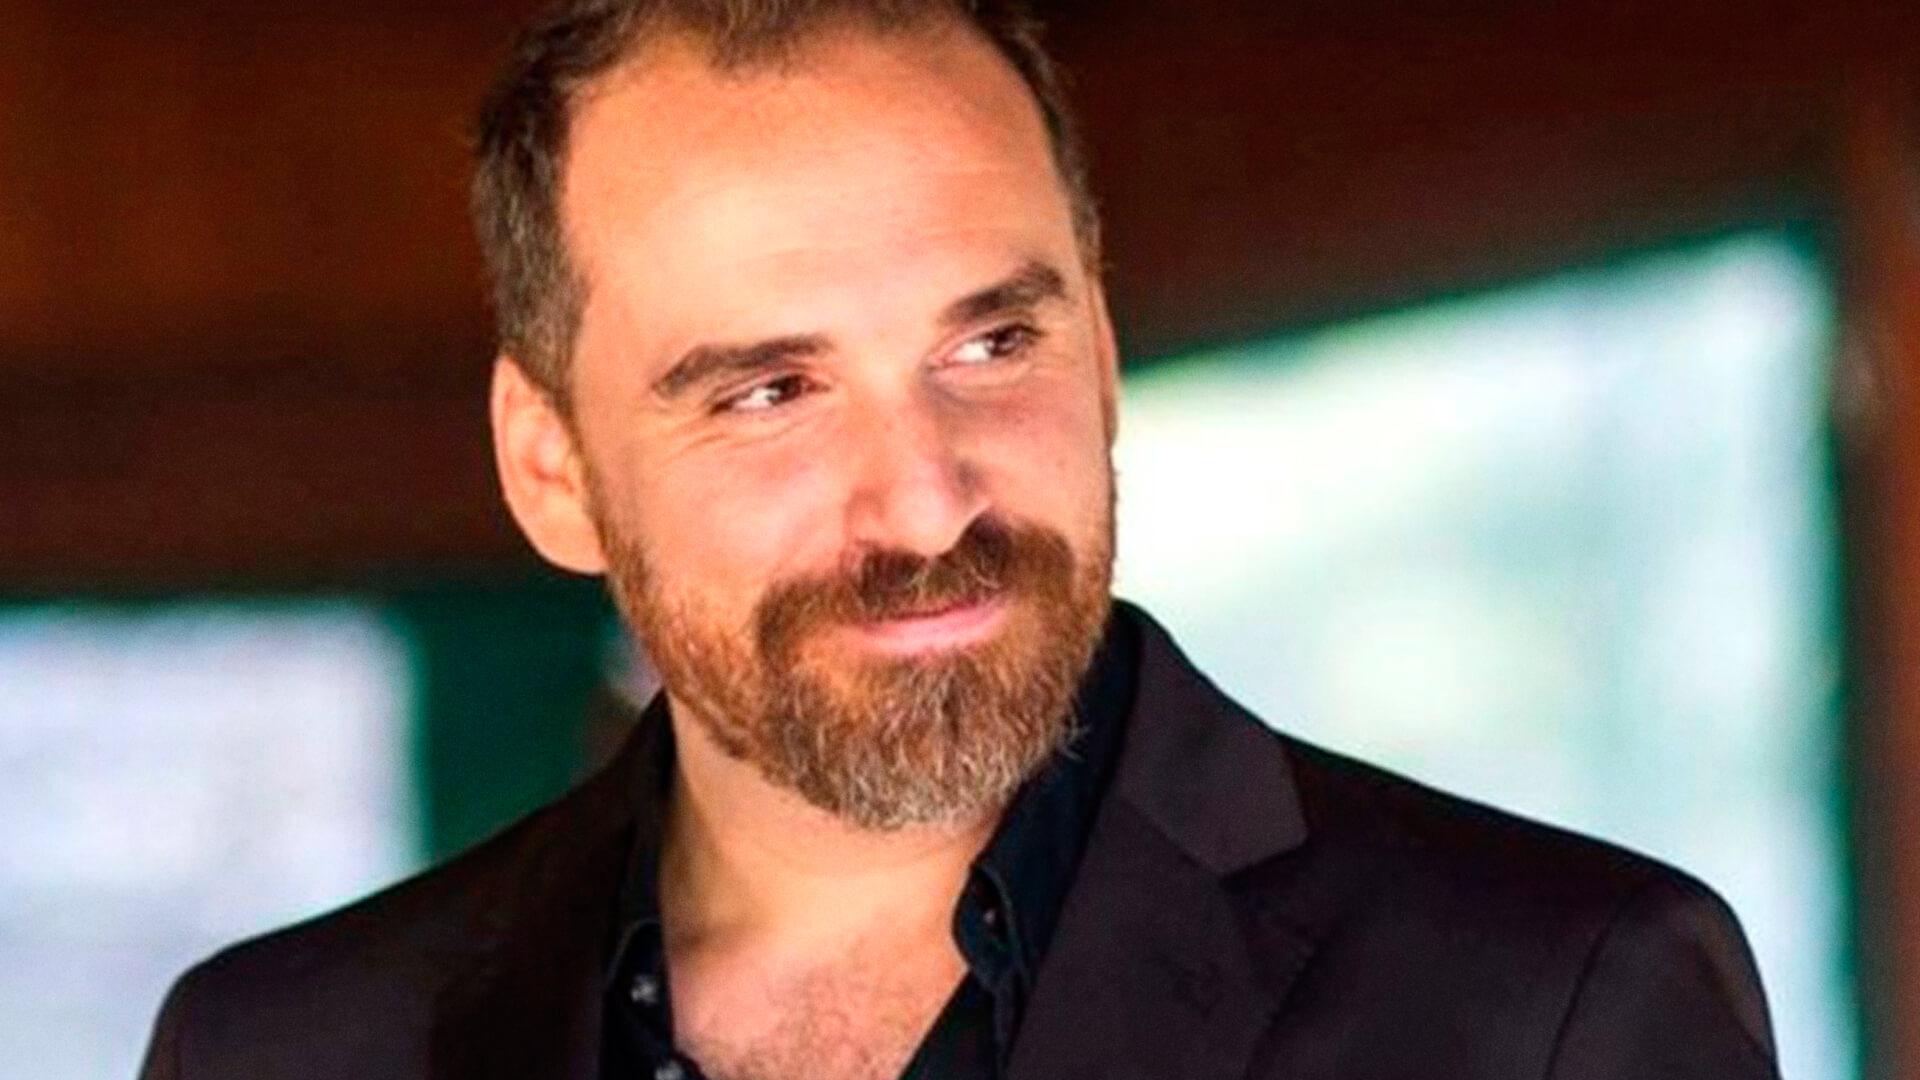 Fernando Sánchez-Cabezudo